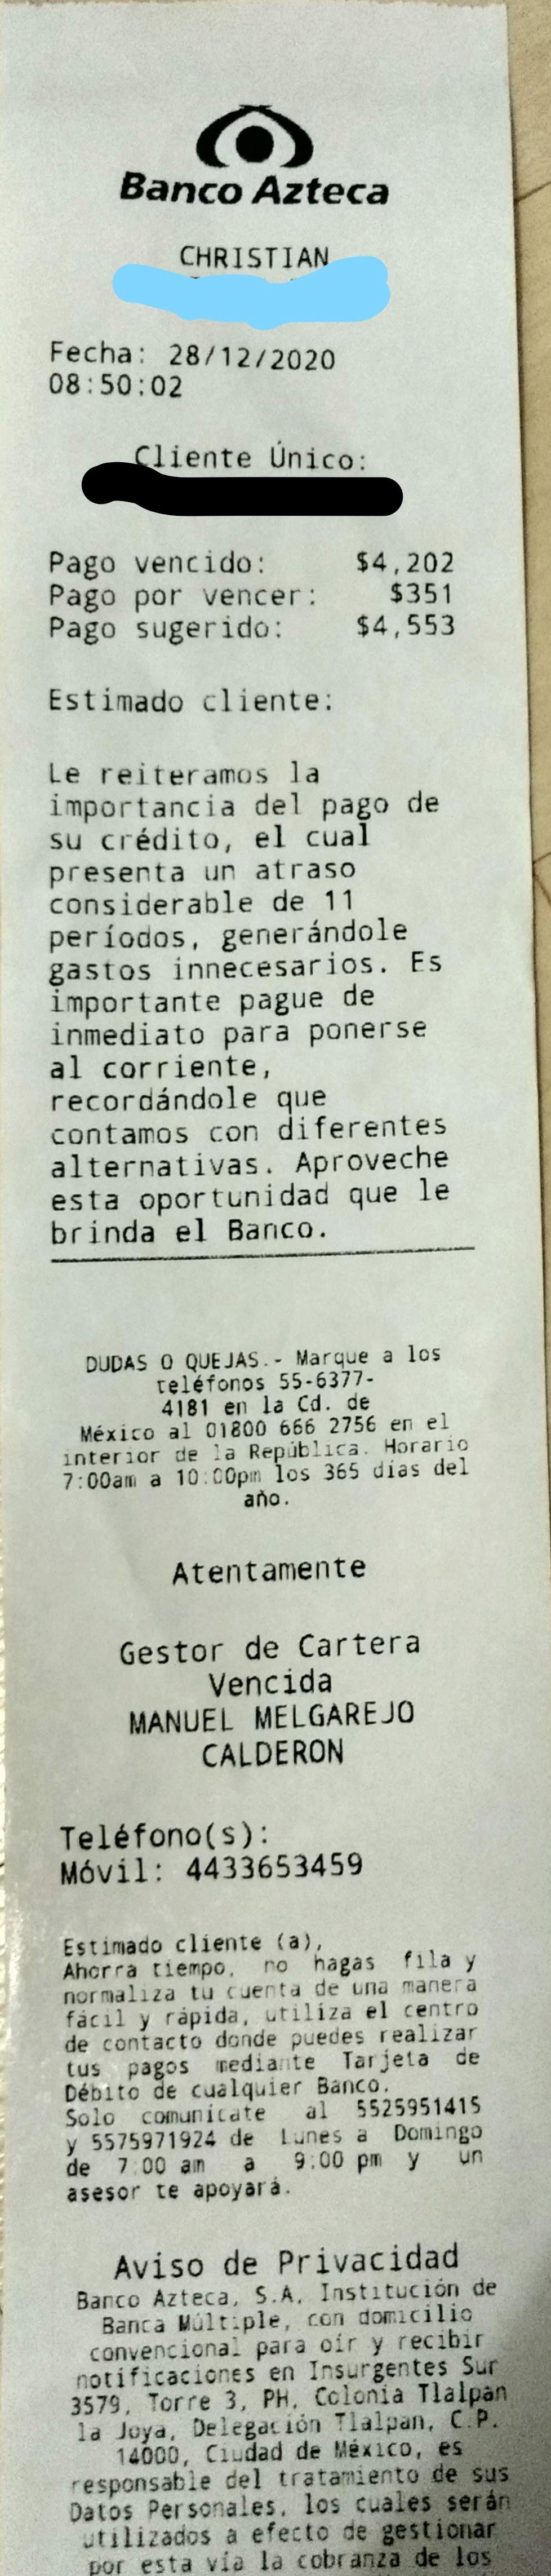 Credito Banco Azteca Inkedi10